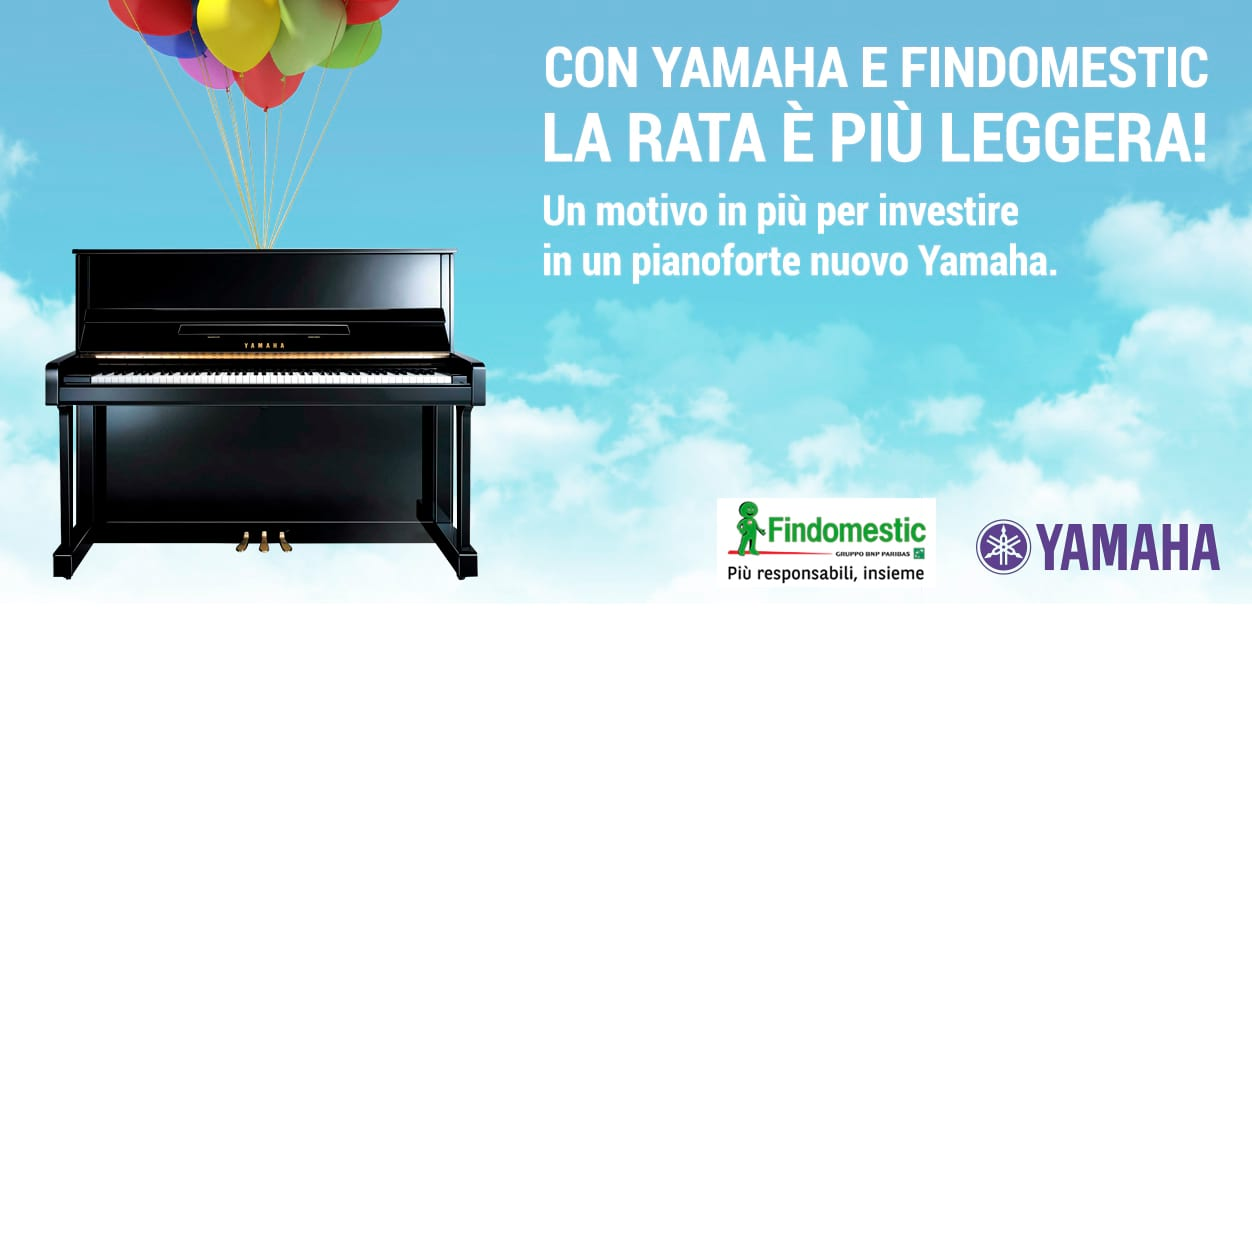 yamaha_findomestic